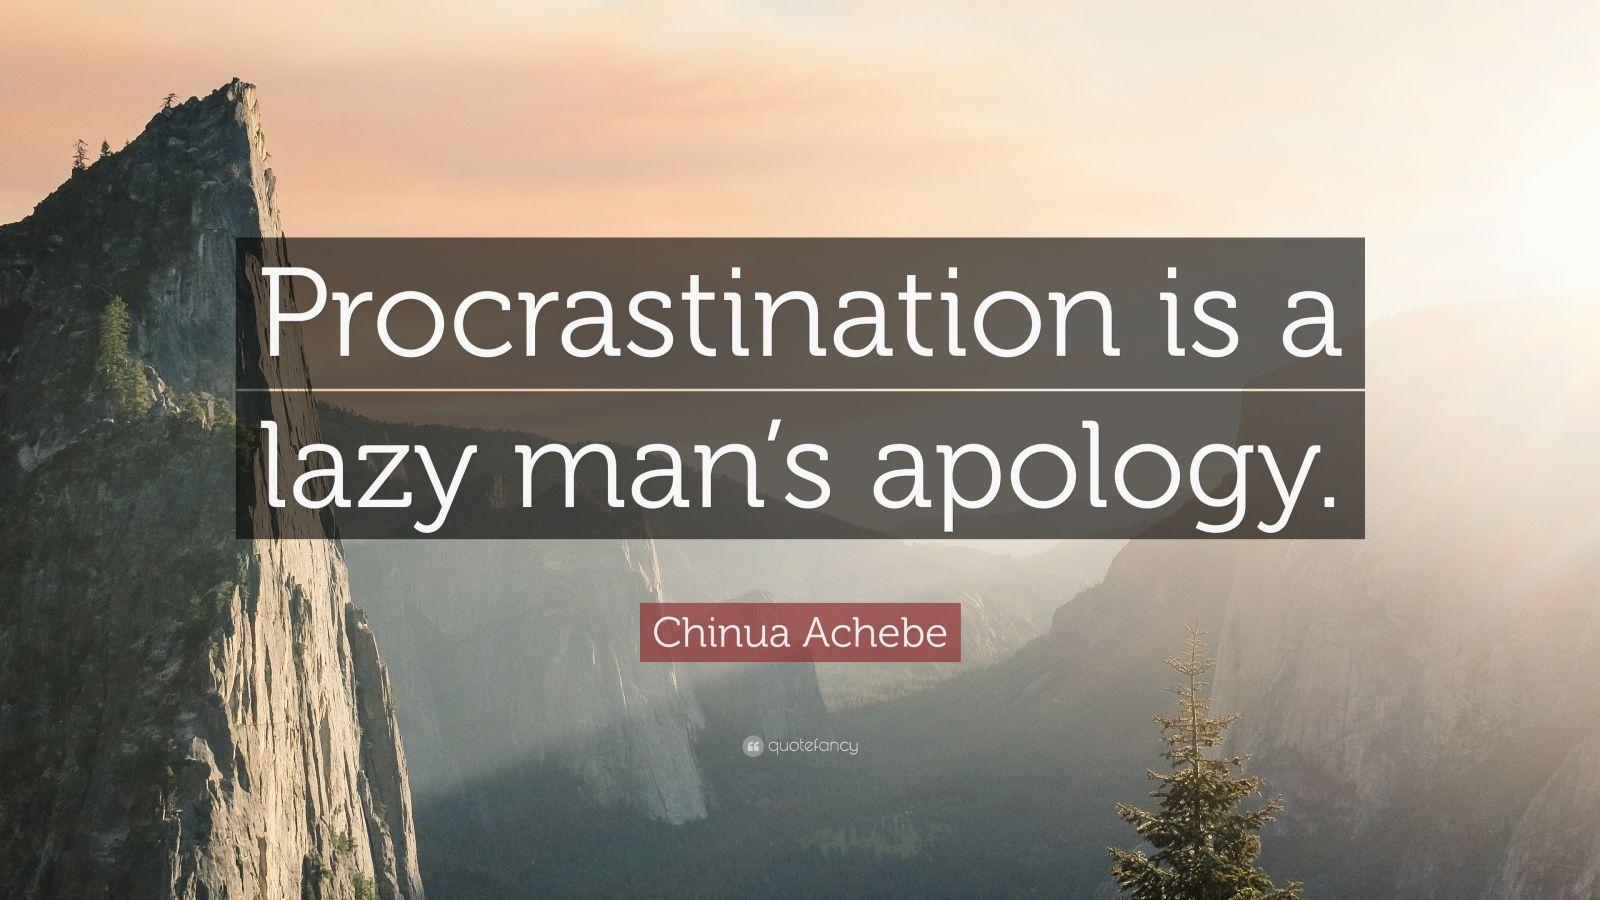 Enjoy Life Quotes Wallpapers Procrastination Quotes 41 Wallpapers Quotefancy